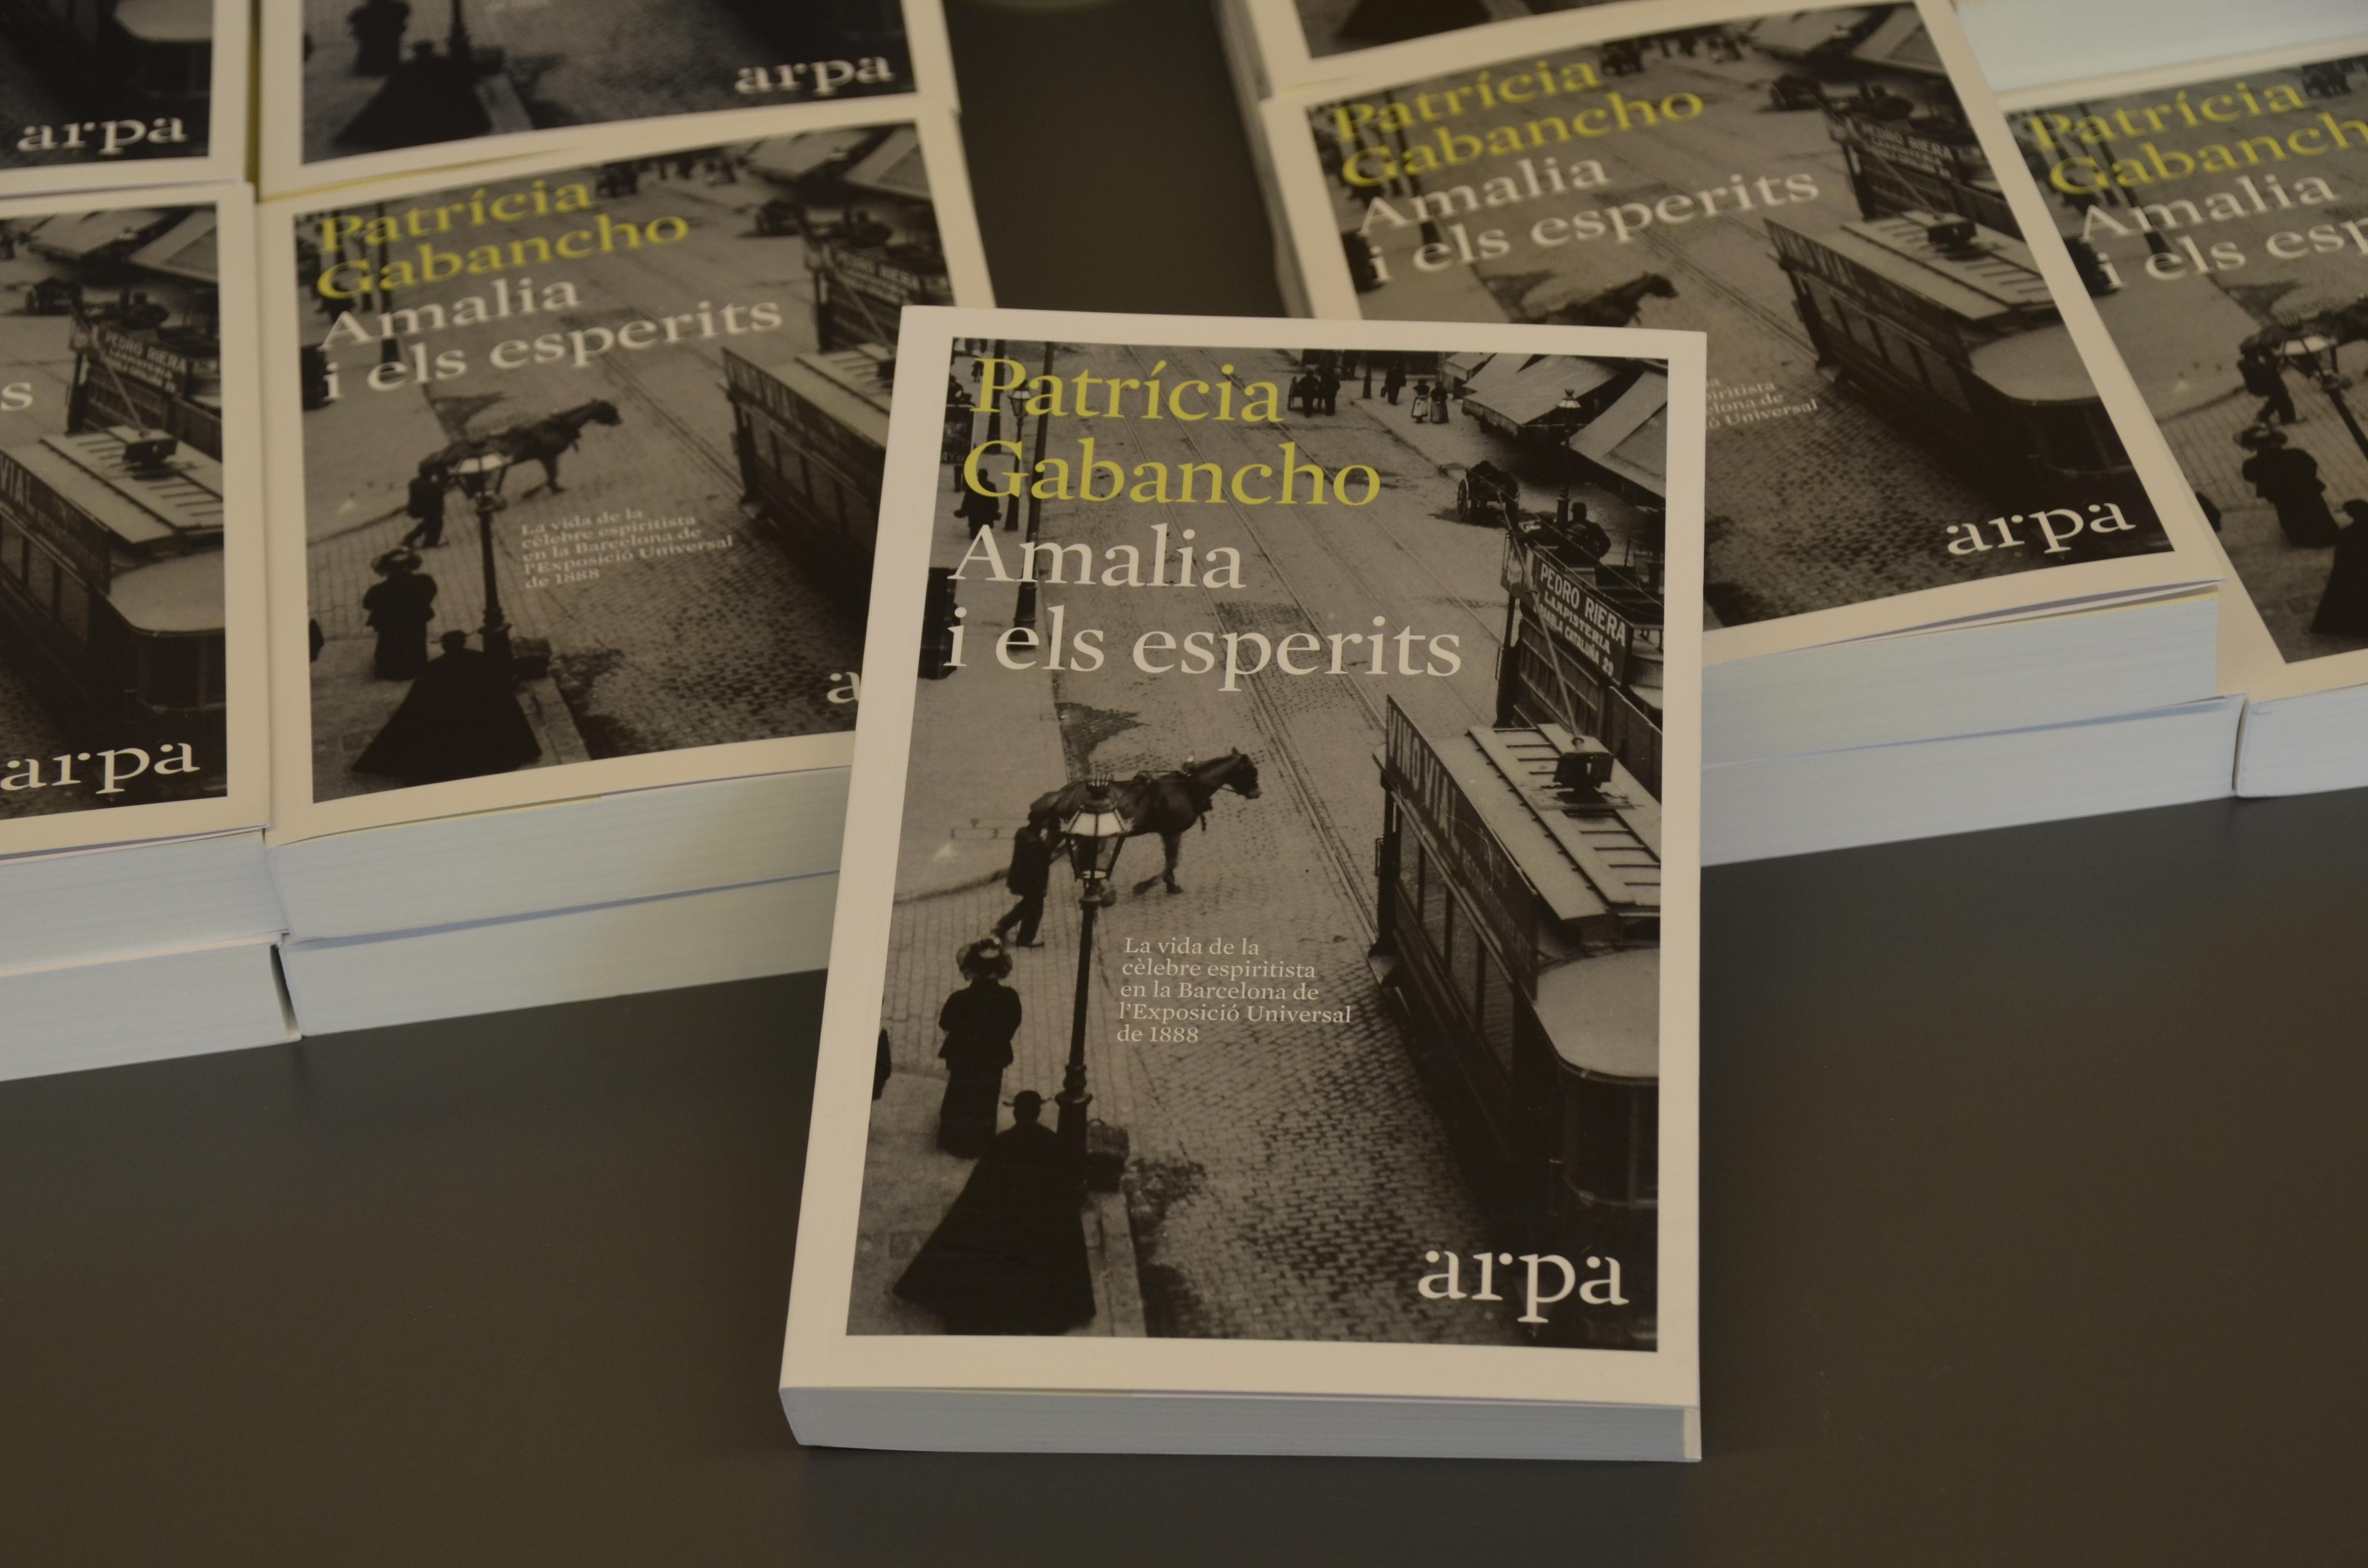 Amalia i els esperits